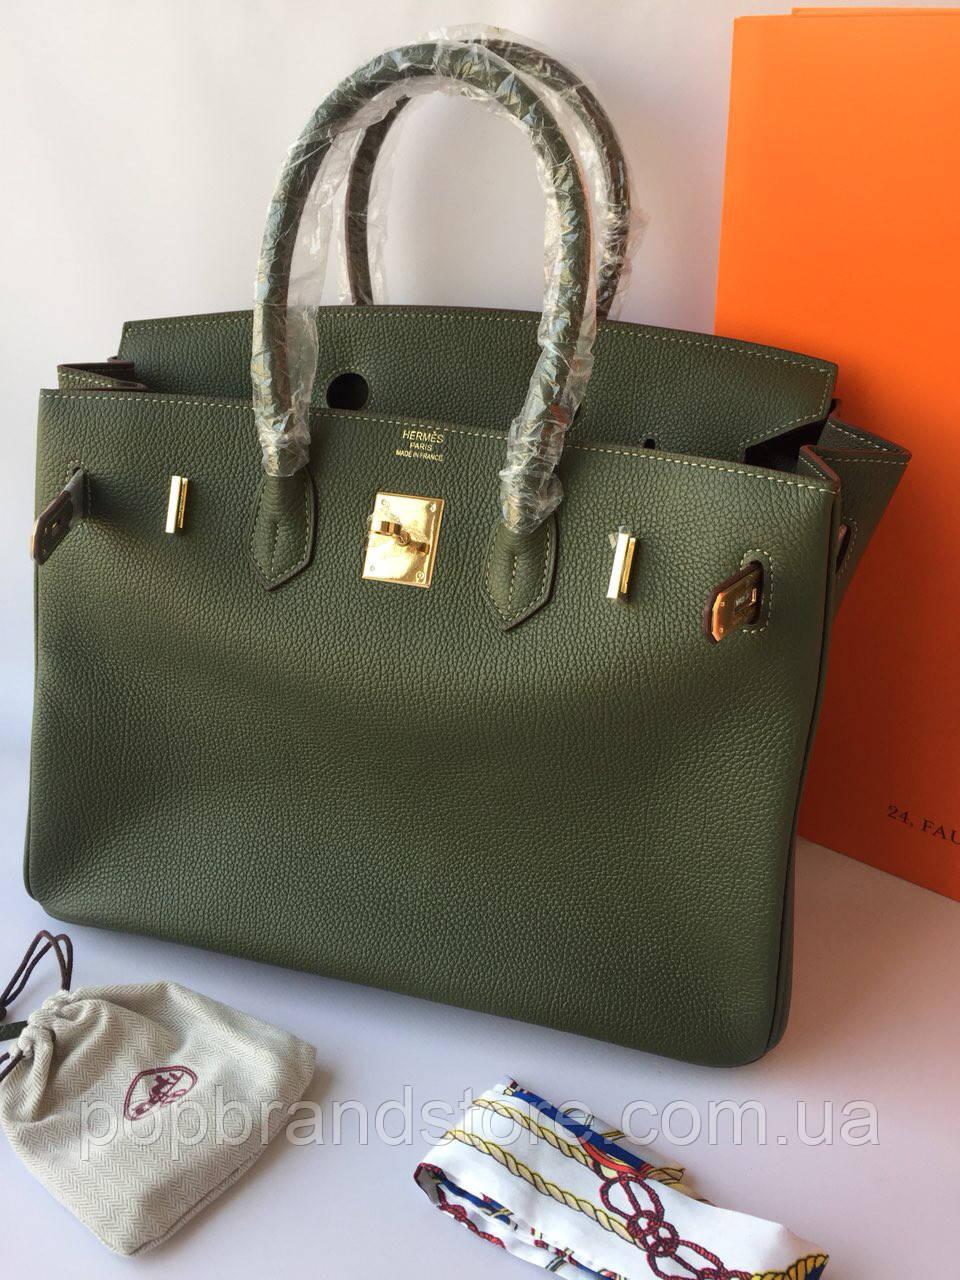 ae6a35bf202e Женская сумка Гермес Биркин 35 см оливка (реплика) - Pop Brand Store    брендовые